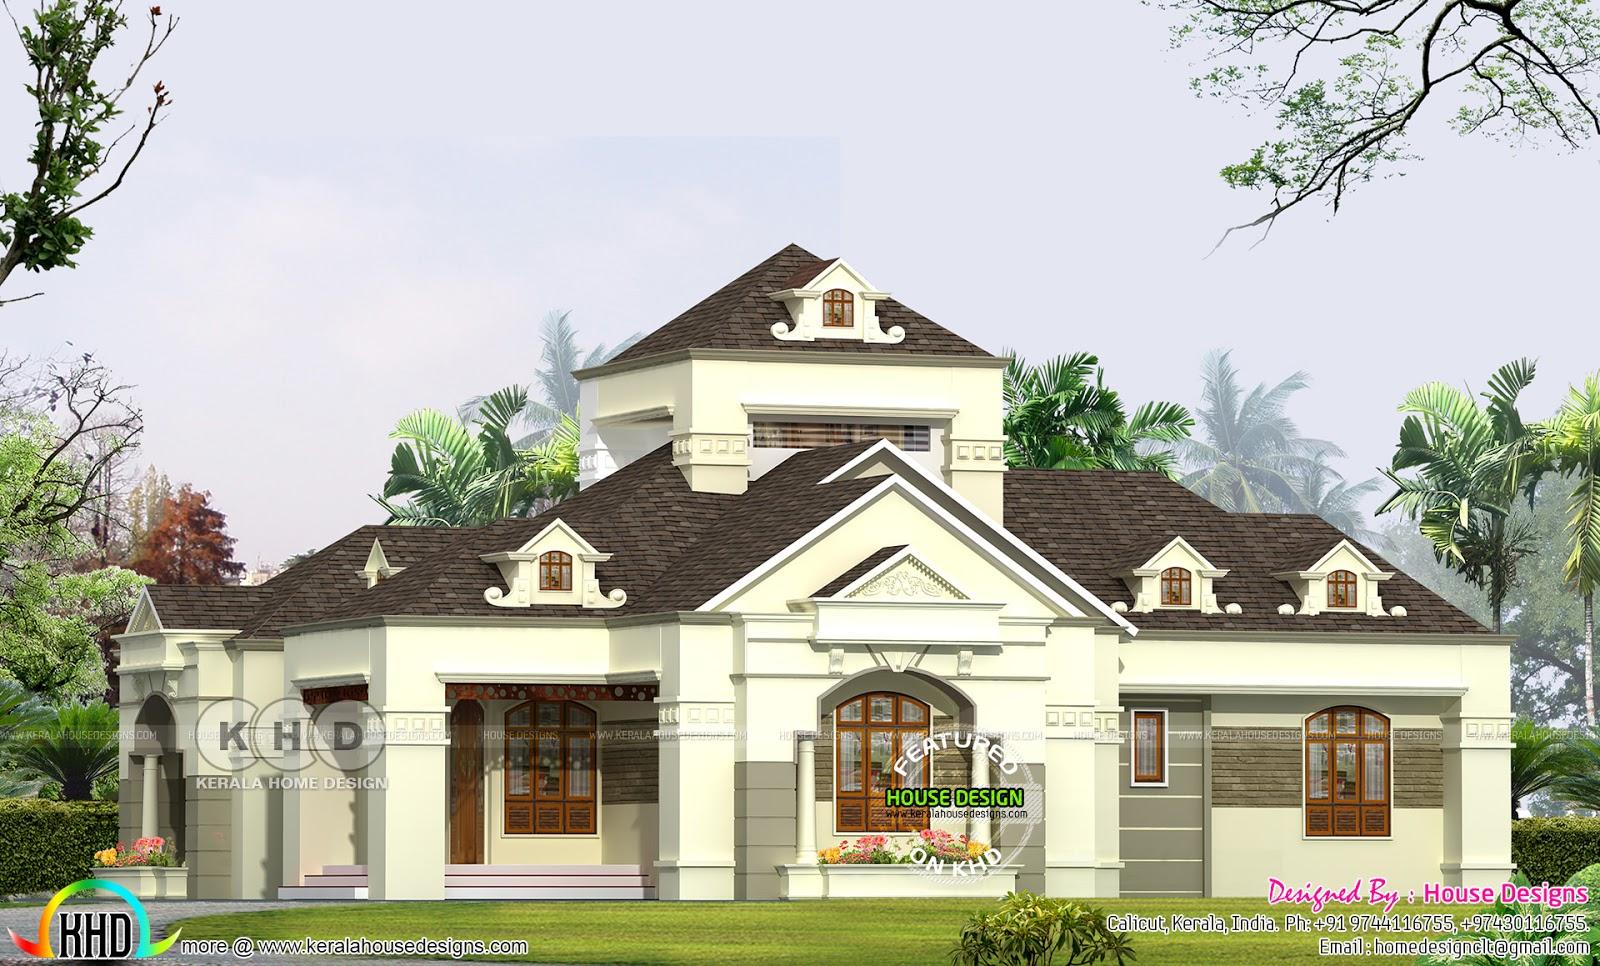 Best Villa Home Designs Contemporary - Home Decorating Ideas ...